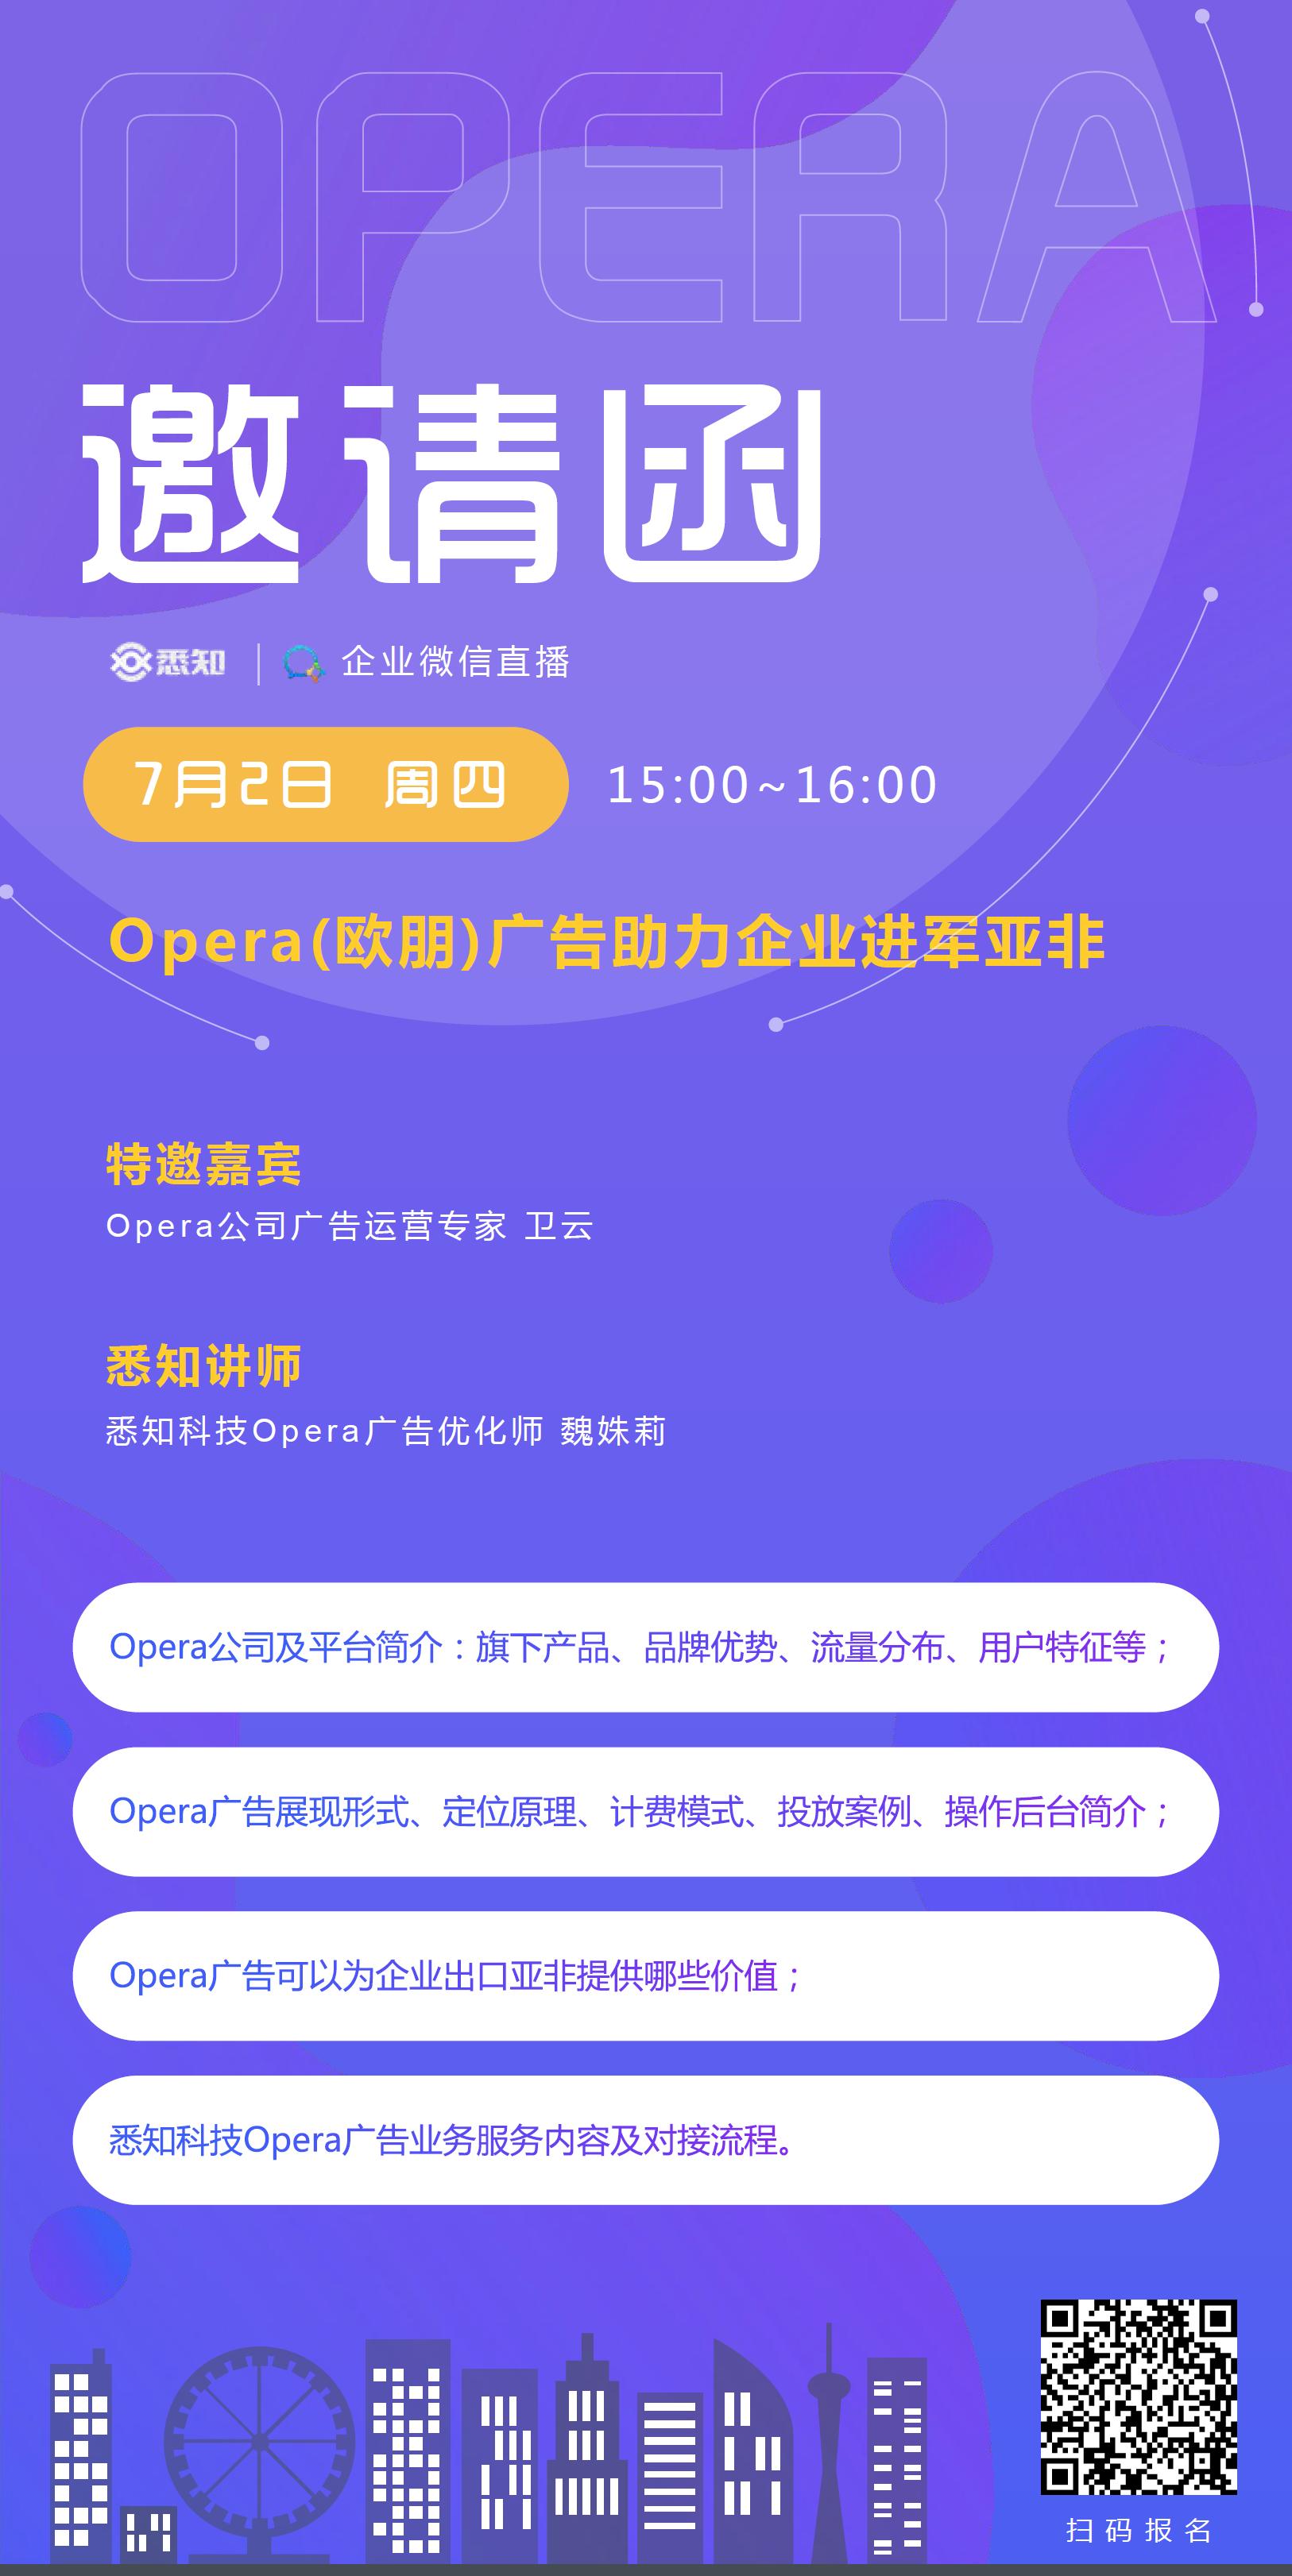 Opera邀请函.png